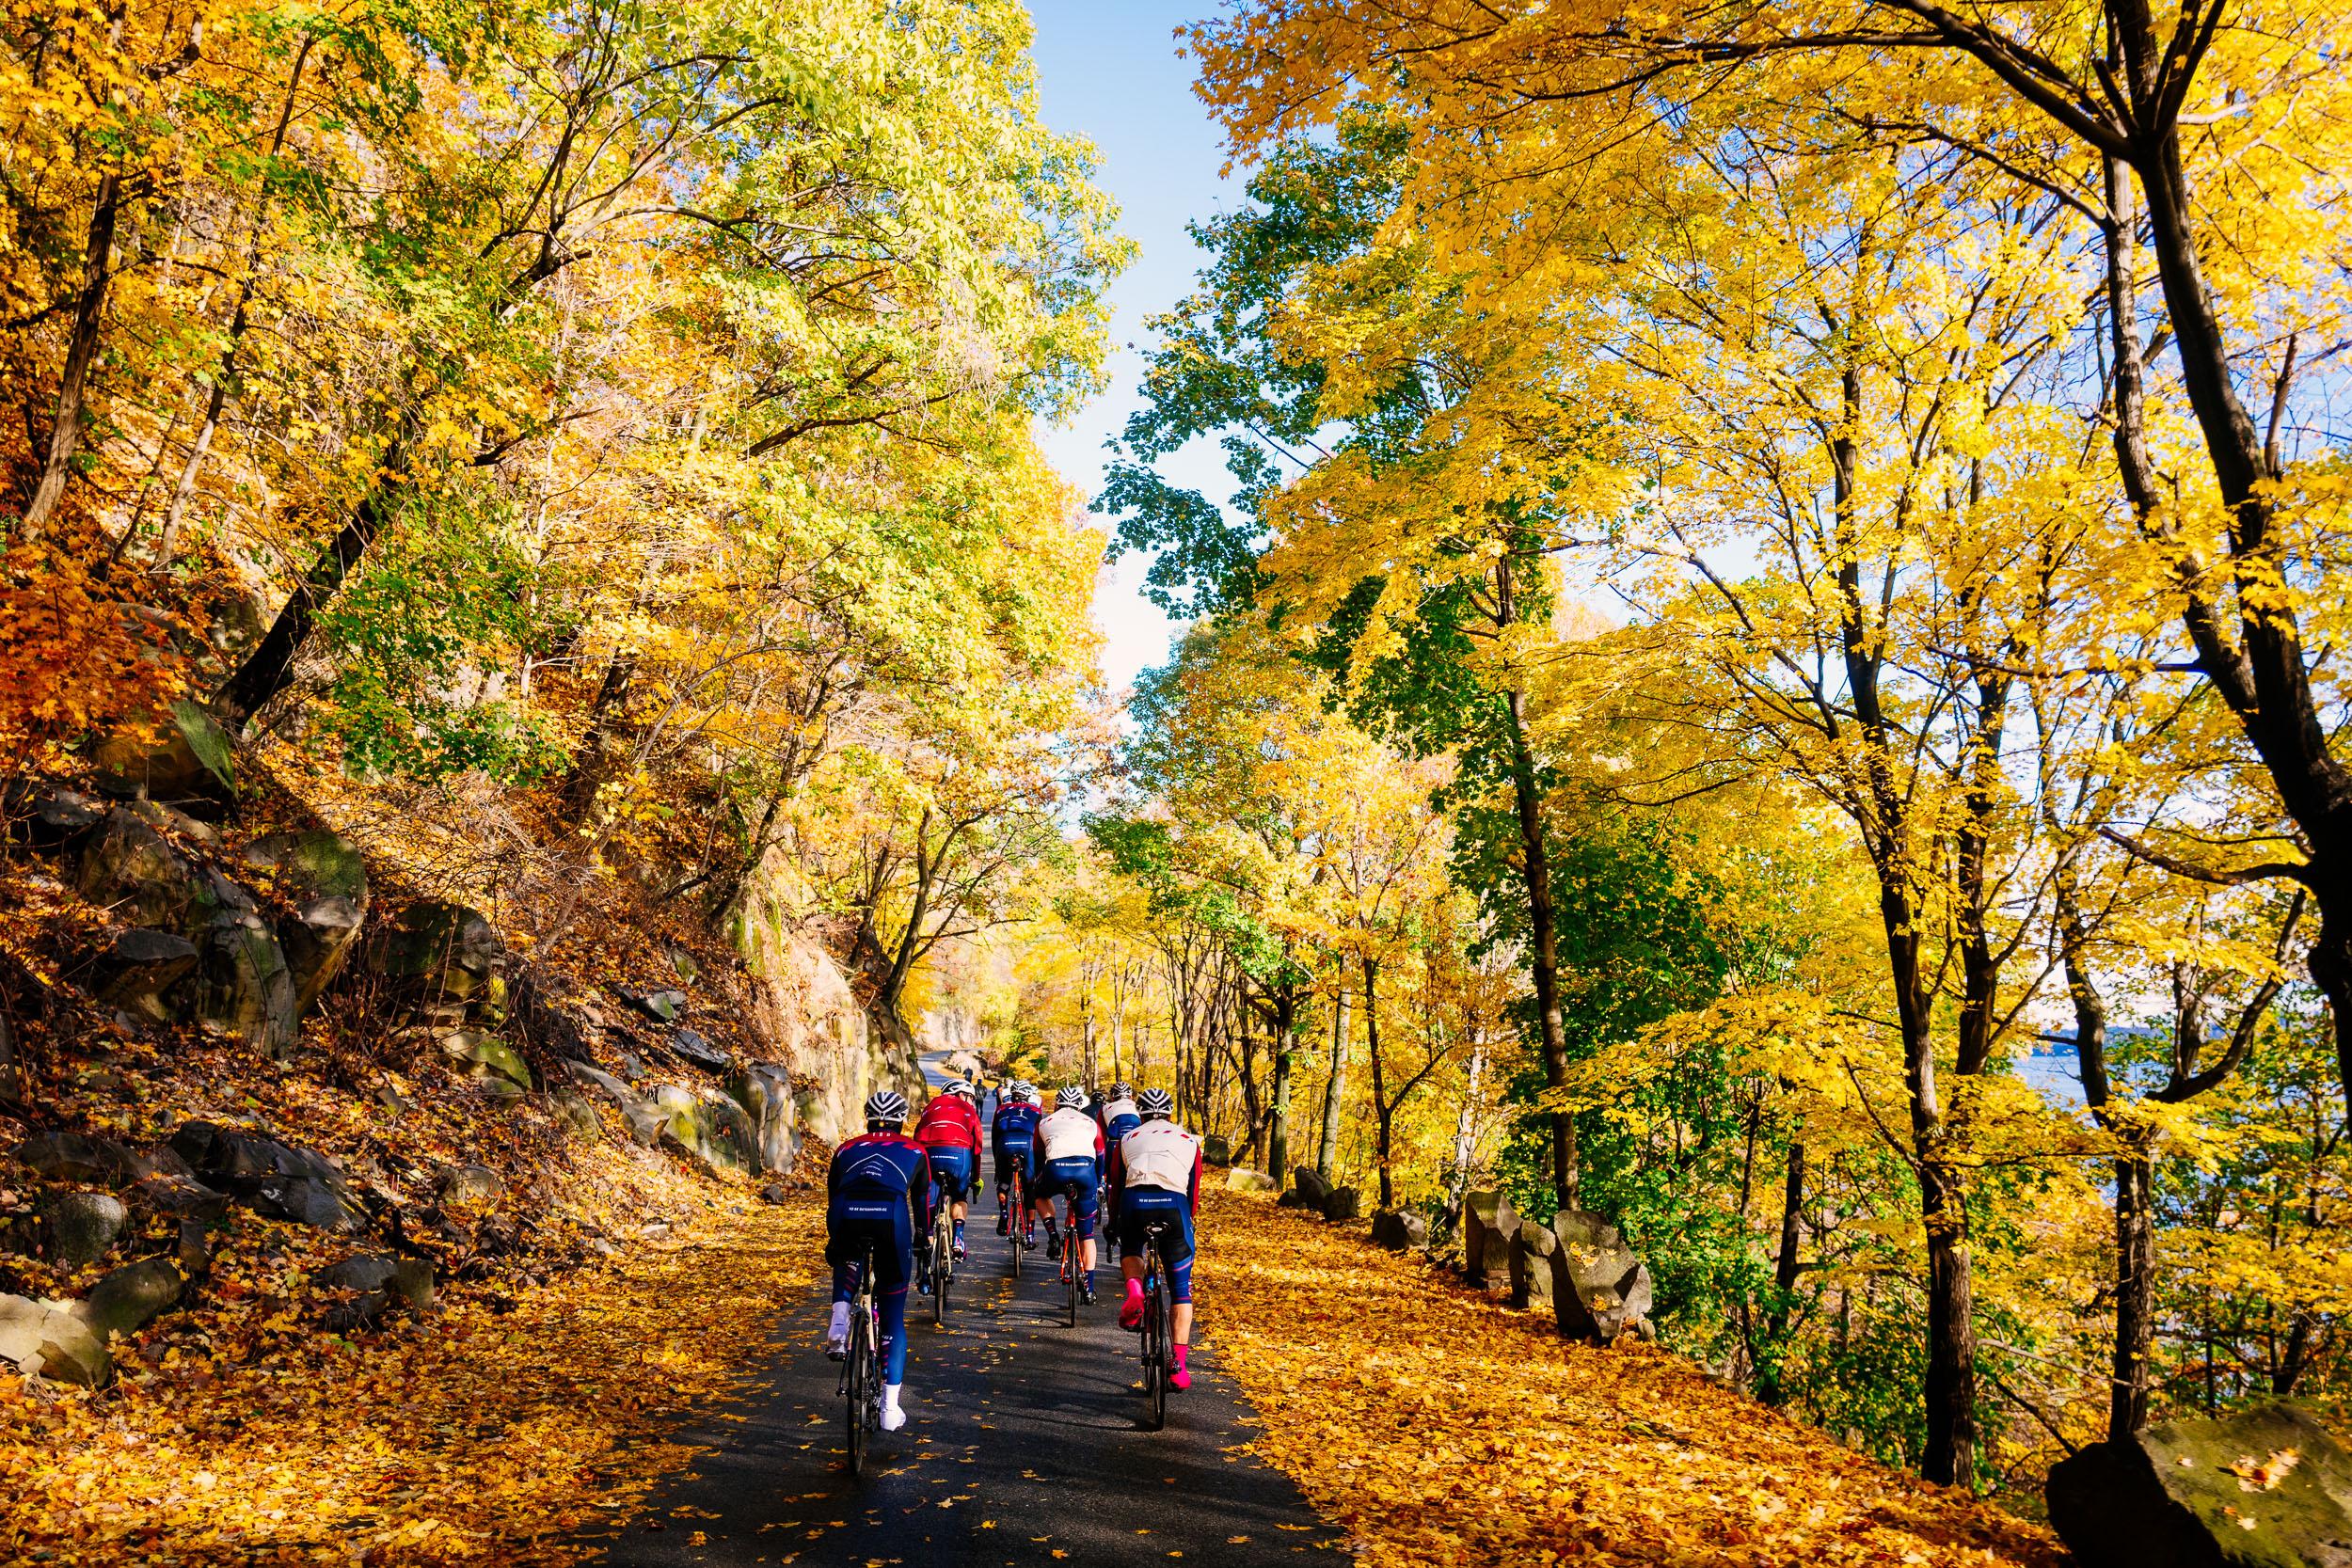 photo-rhetoric-to-be-determined-river-road-fall-foliage-5017.jpg